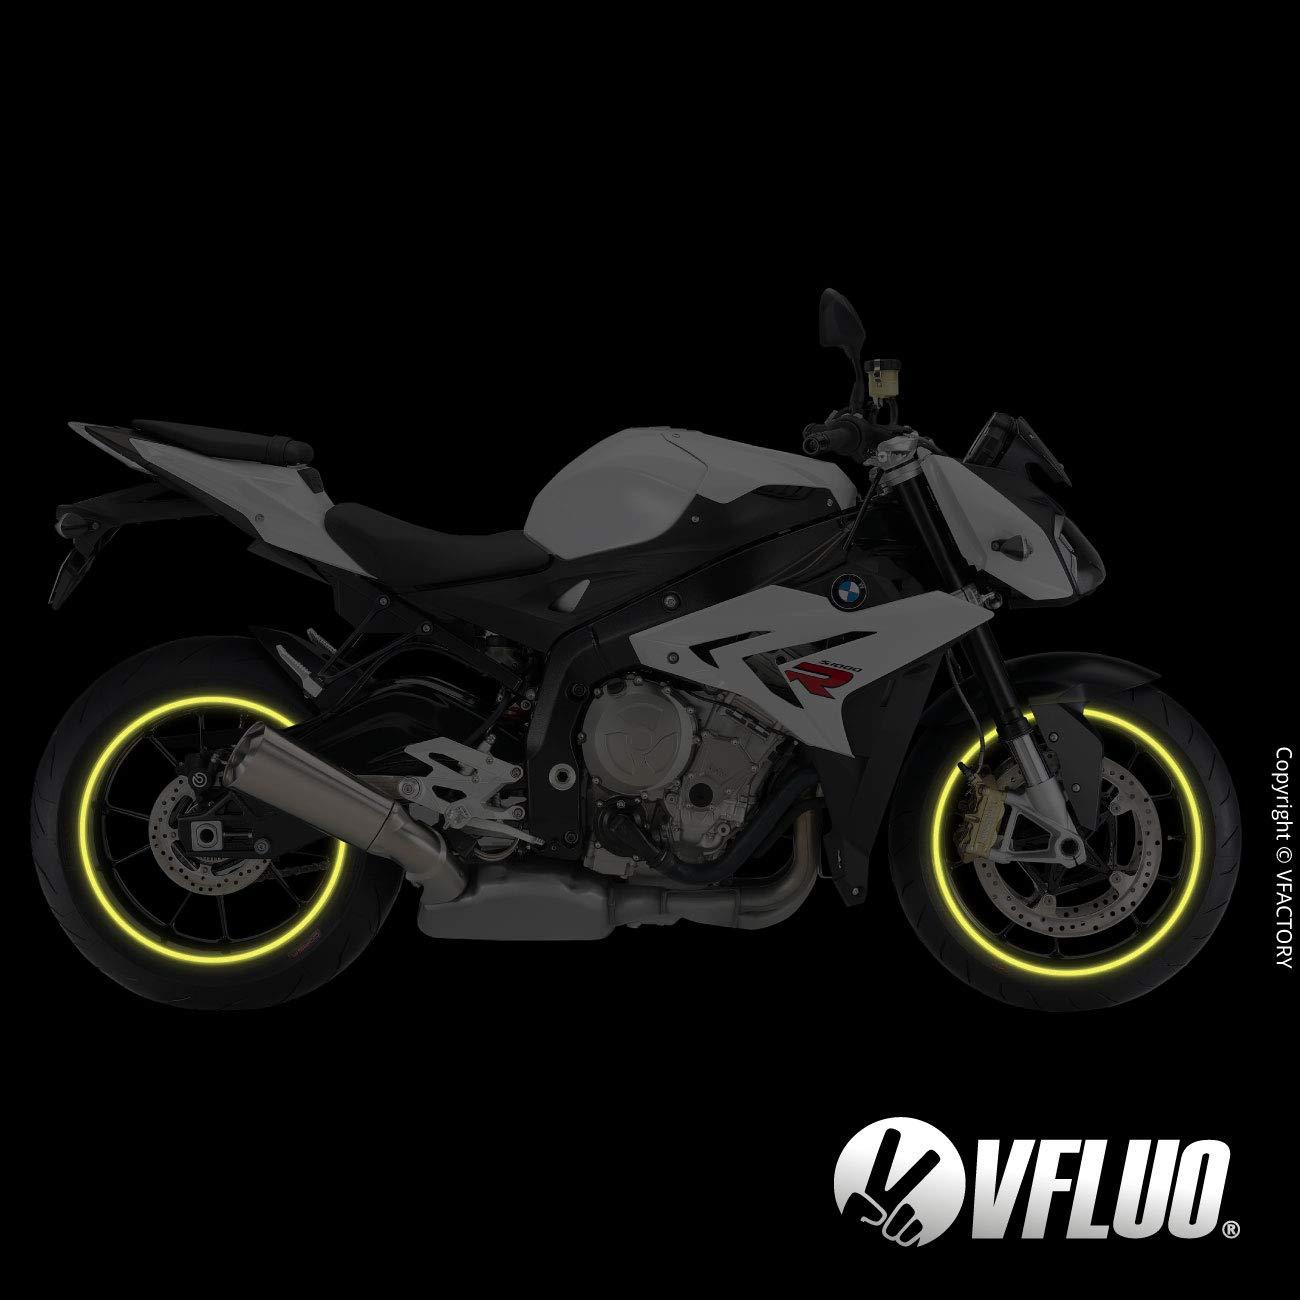 3M Technology/™ VFLUO CIRCULAR/™ 1 wheel Gold 7 mm width motorcycle retro retro reflective wheel stripes kit